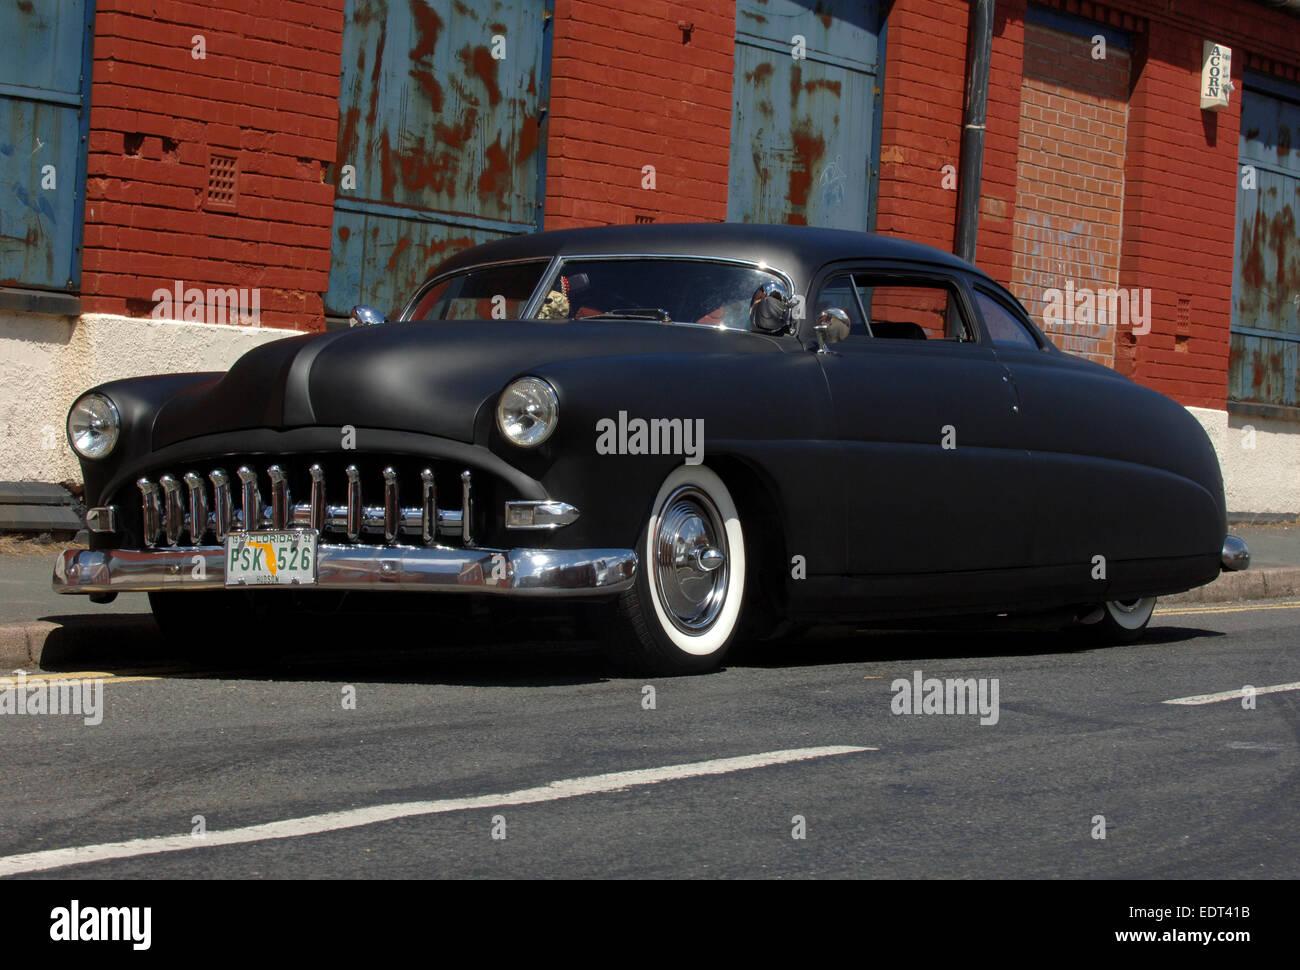 1952 Hudson Lead Sled chopped, channeled and lowered custom car ...